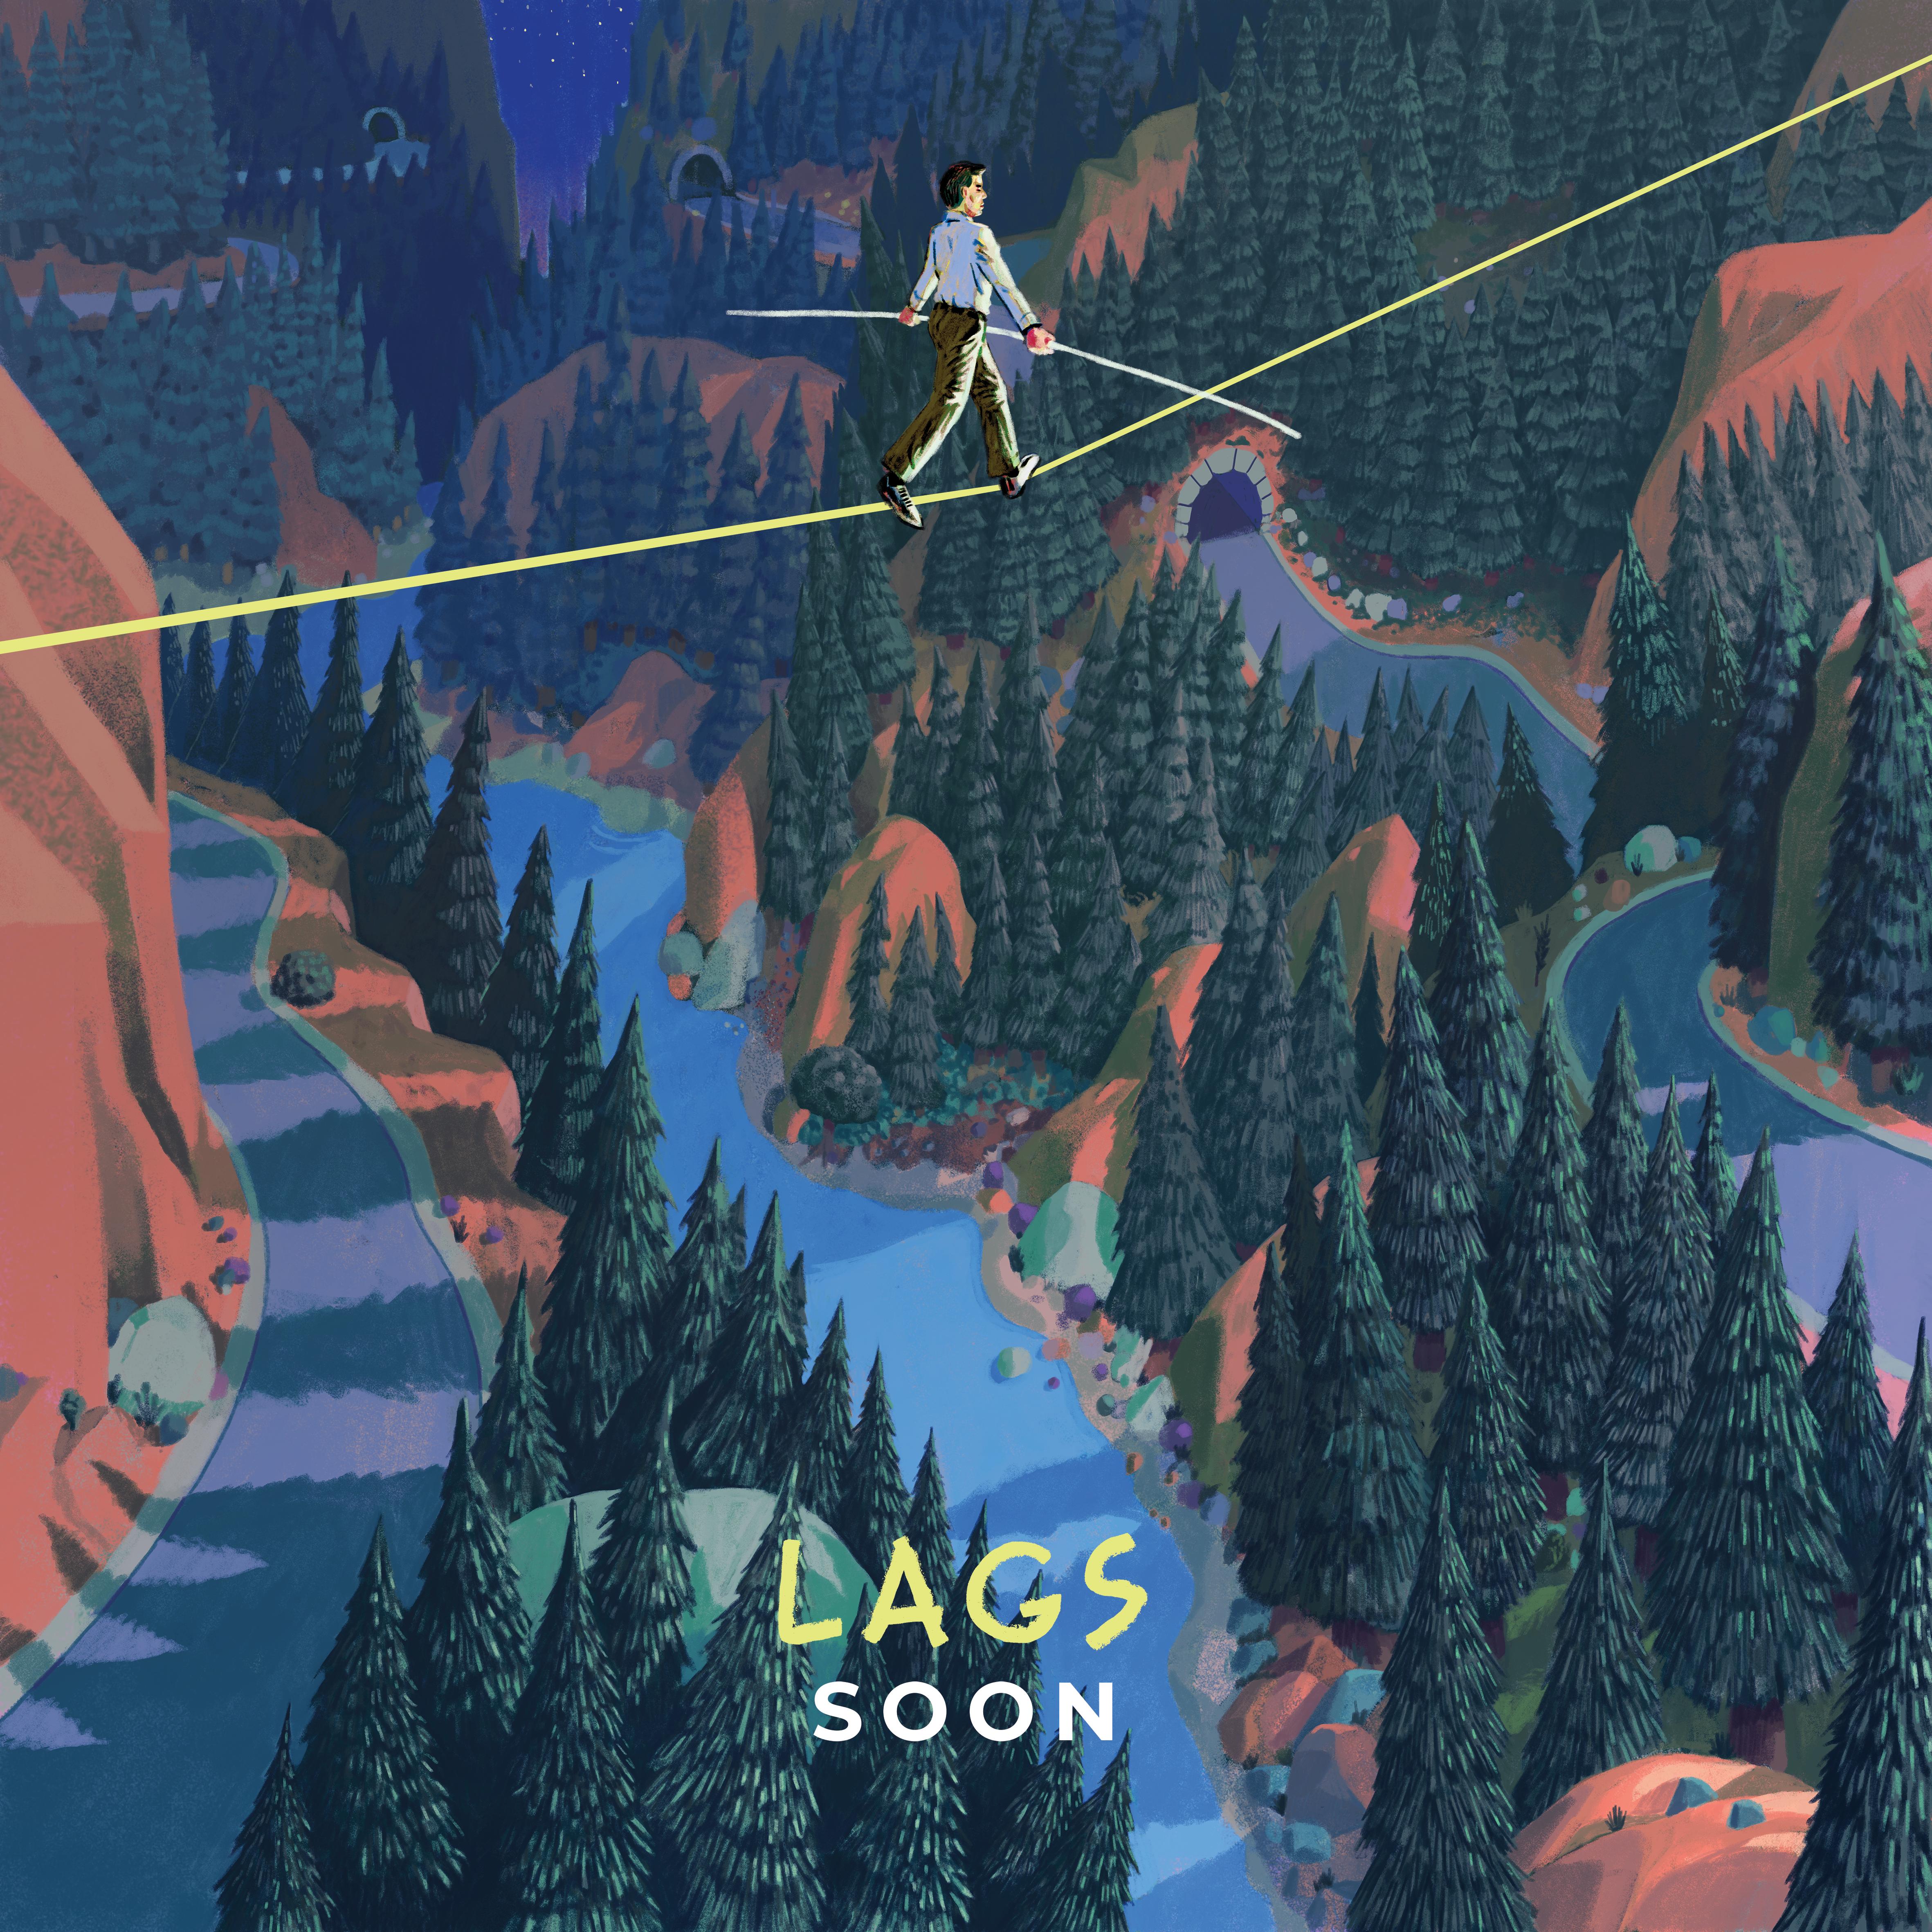 Lags - Soon CD